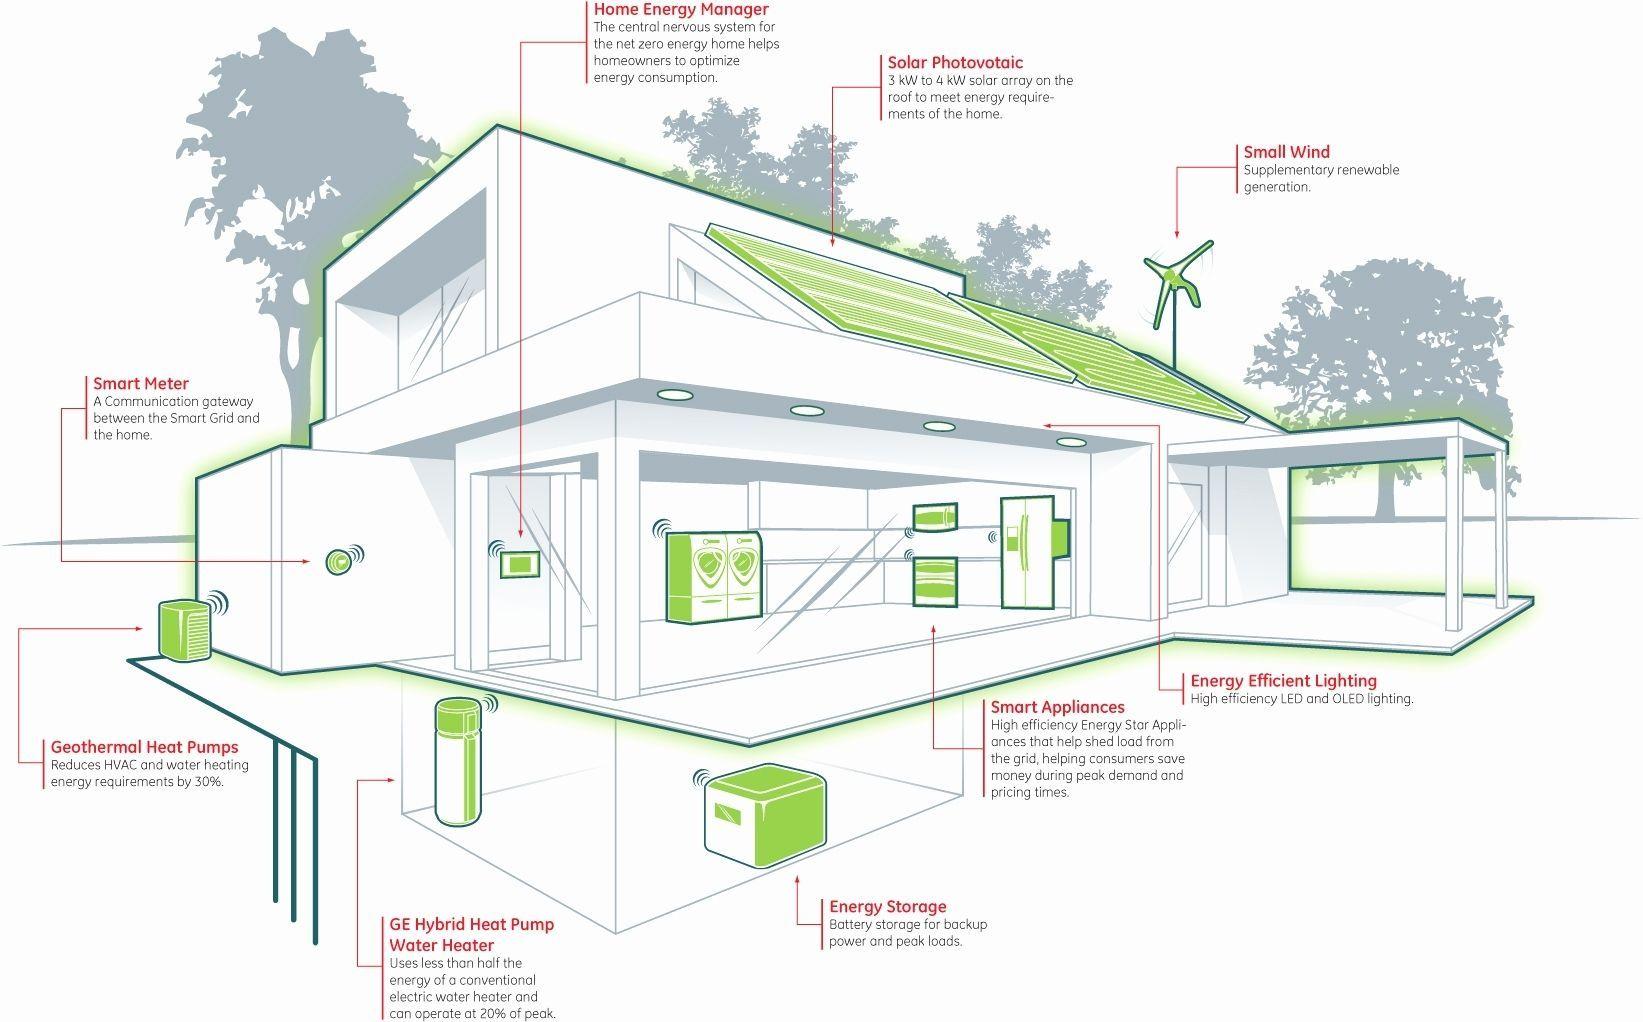 Stunning Zero Energy Home Design Gallery Decorating Design Ideas Elegant Renewable Energy House Design Zold Tetok Hazak Haz Tervek